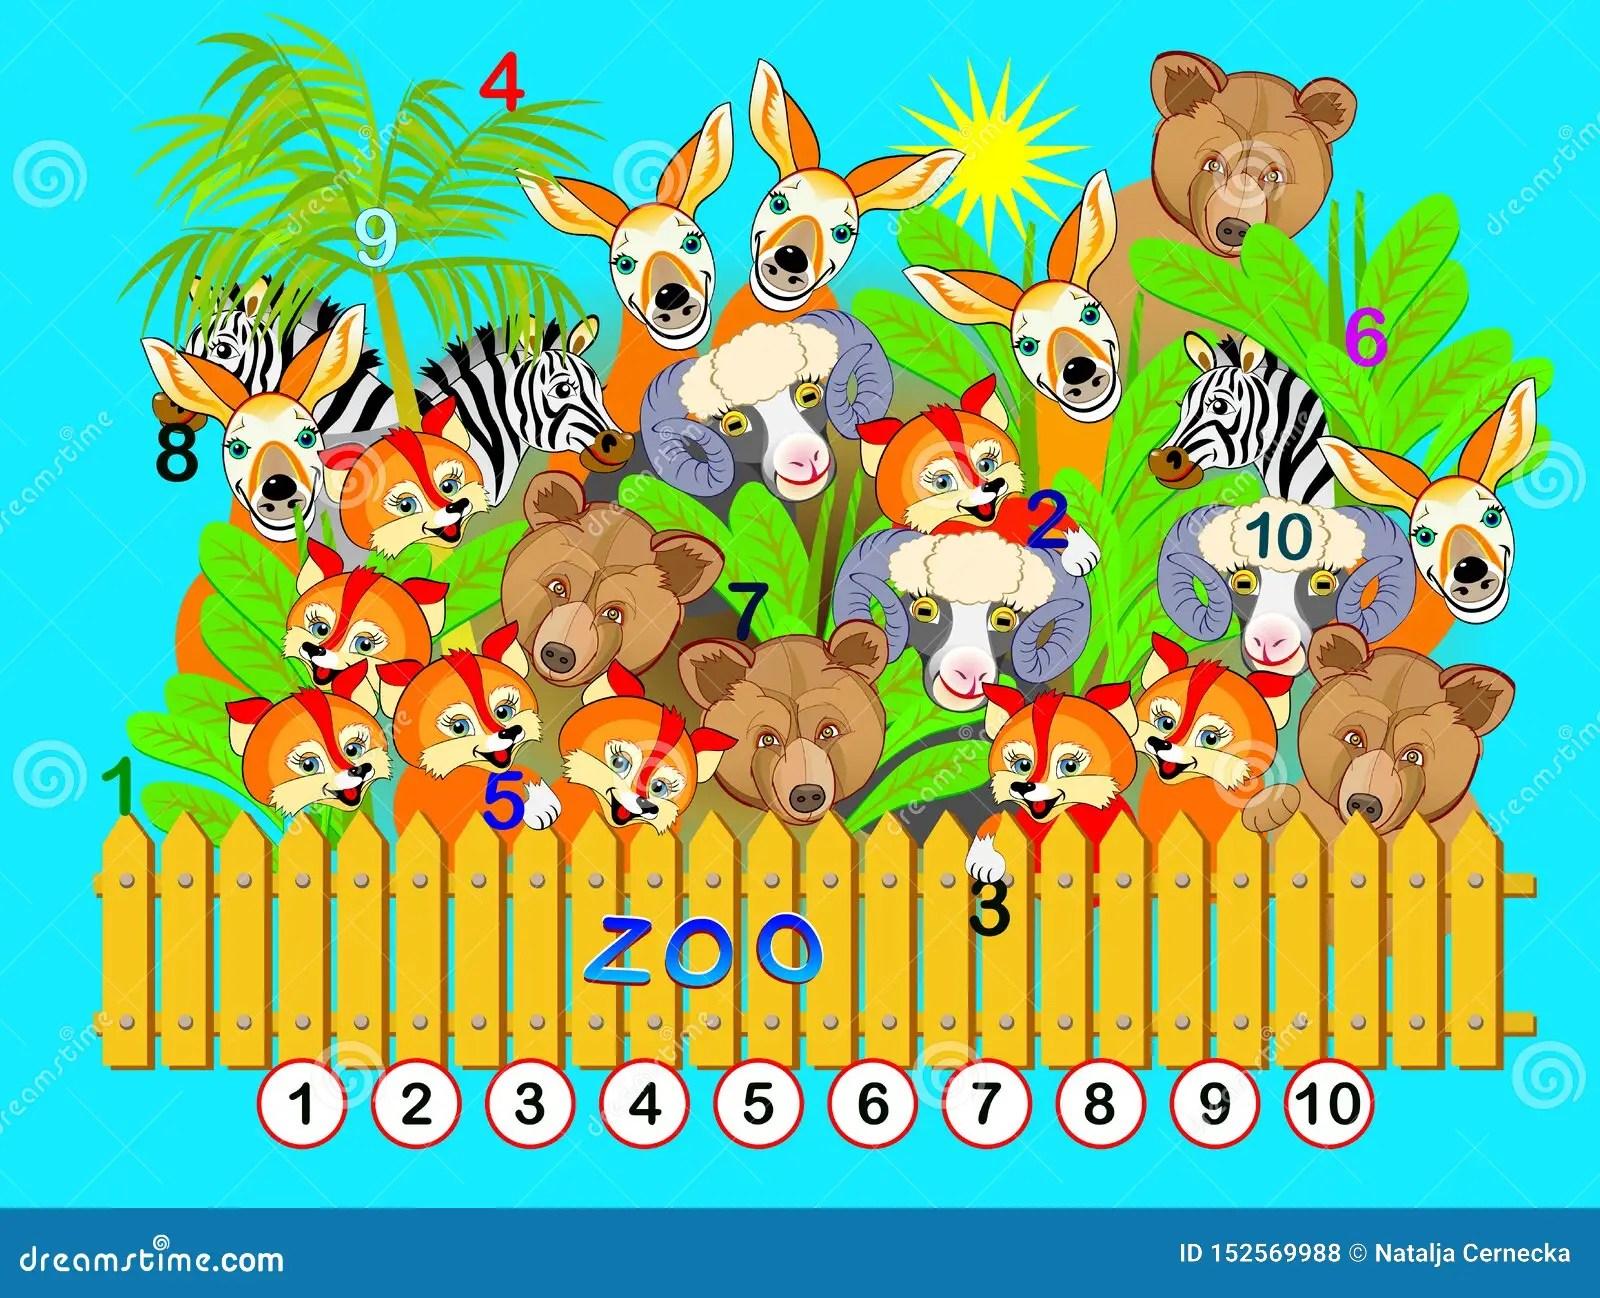 Exercise For Preschool And Kindergarten Kids Numbers 1 To